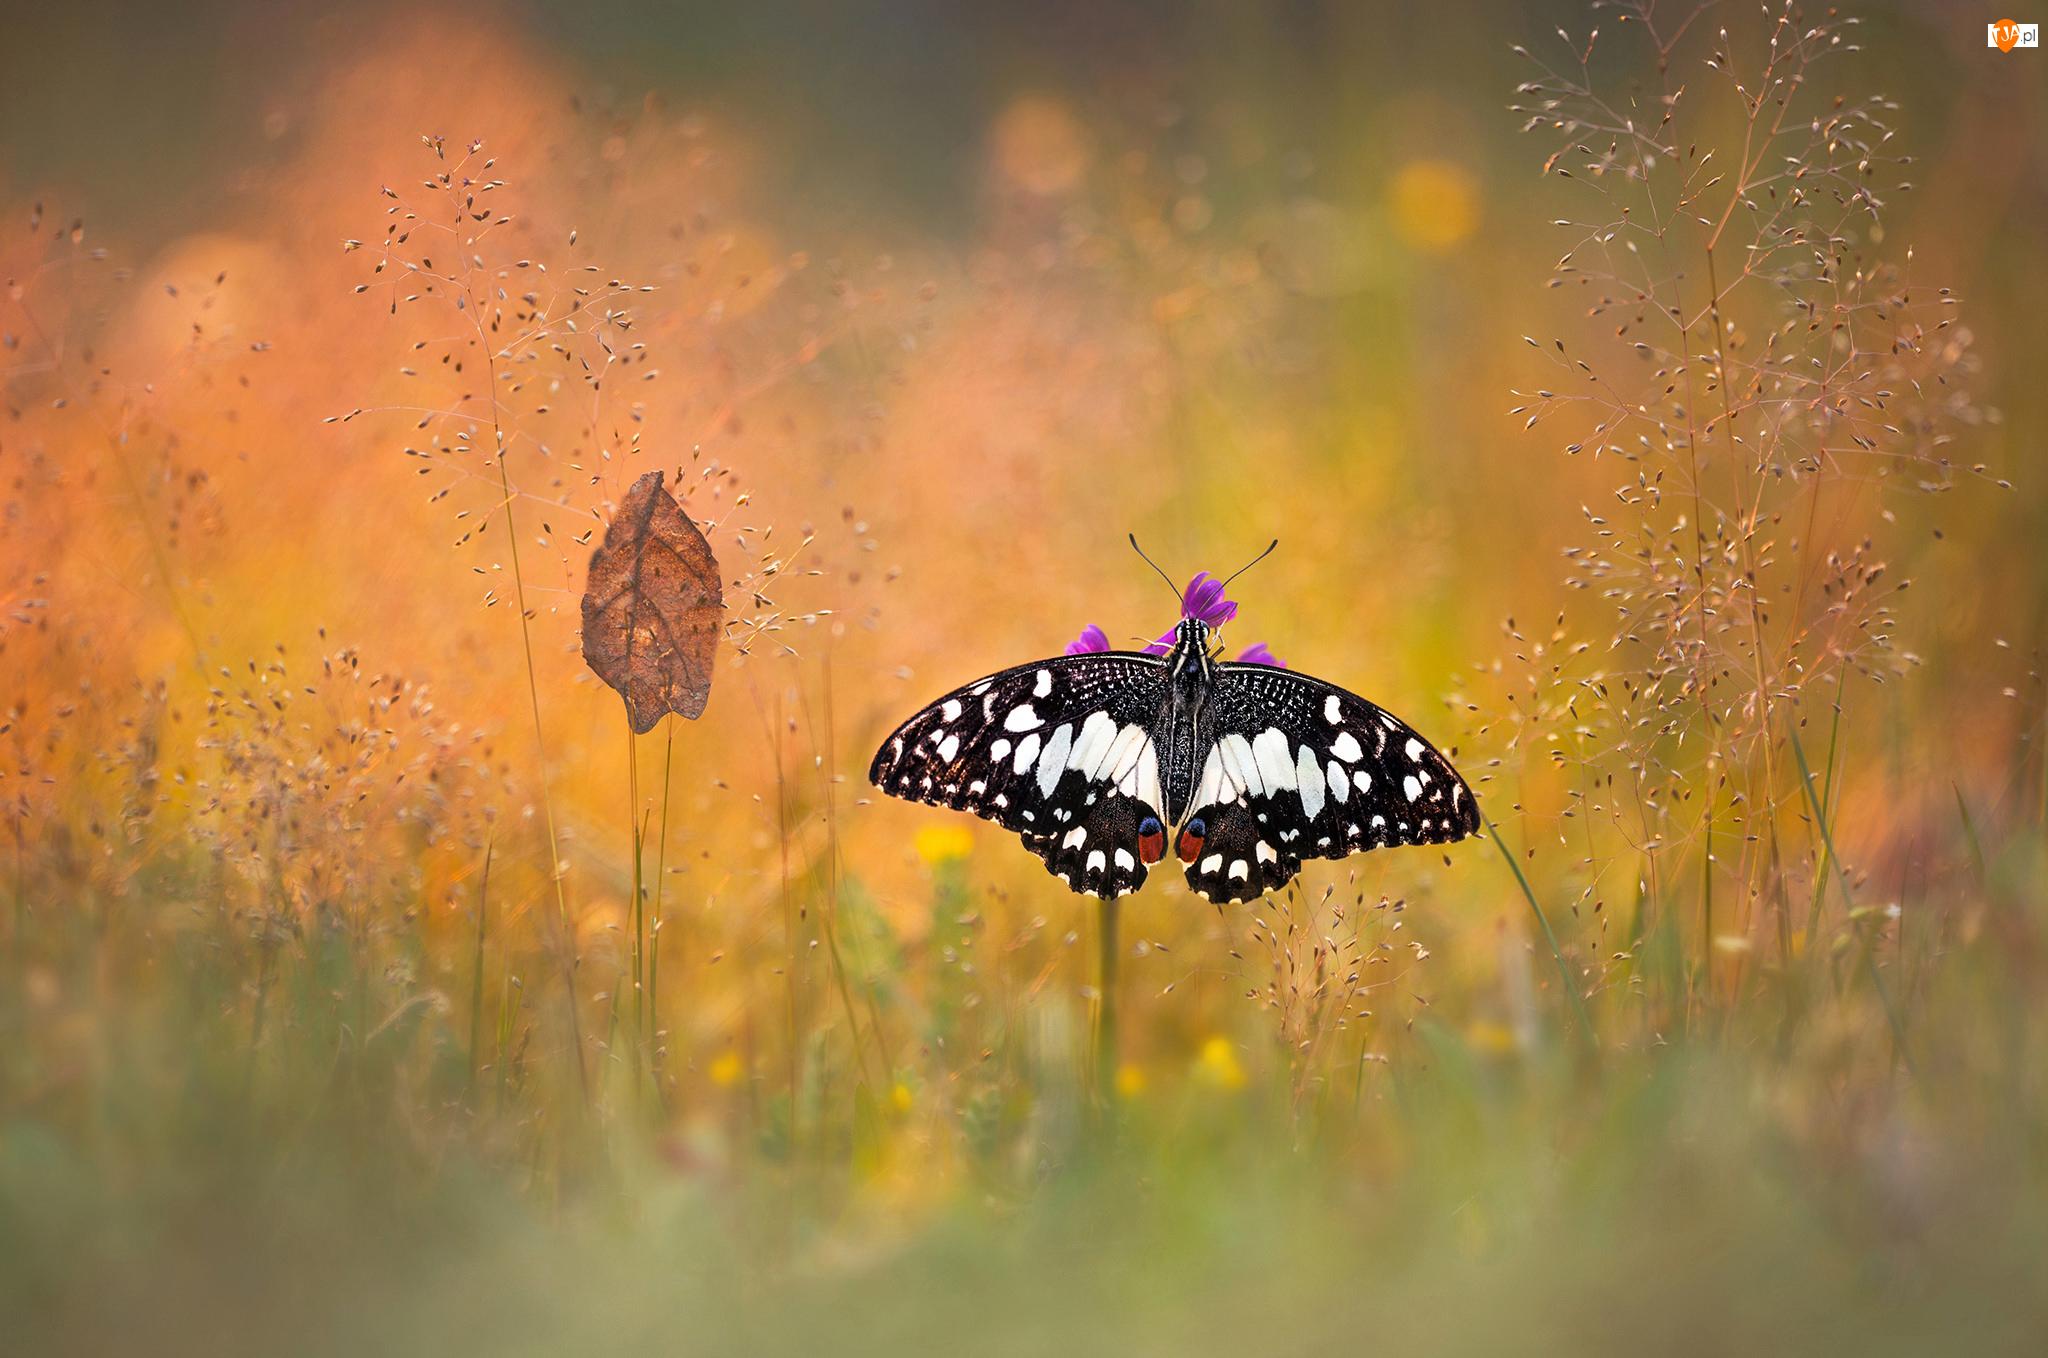 Bokeh, Motyl, Trawa, Papilio demodocus, Liść